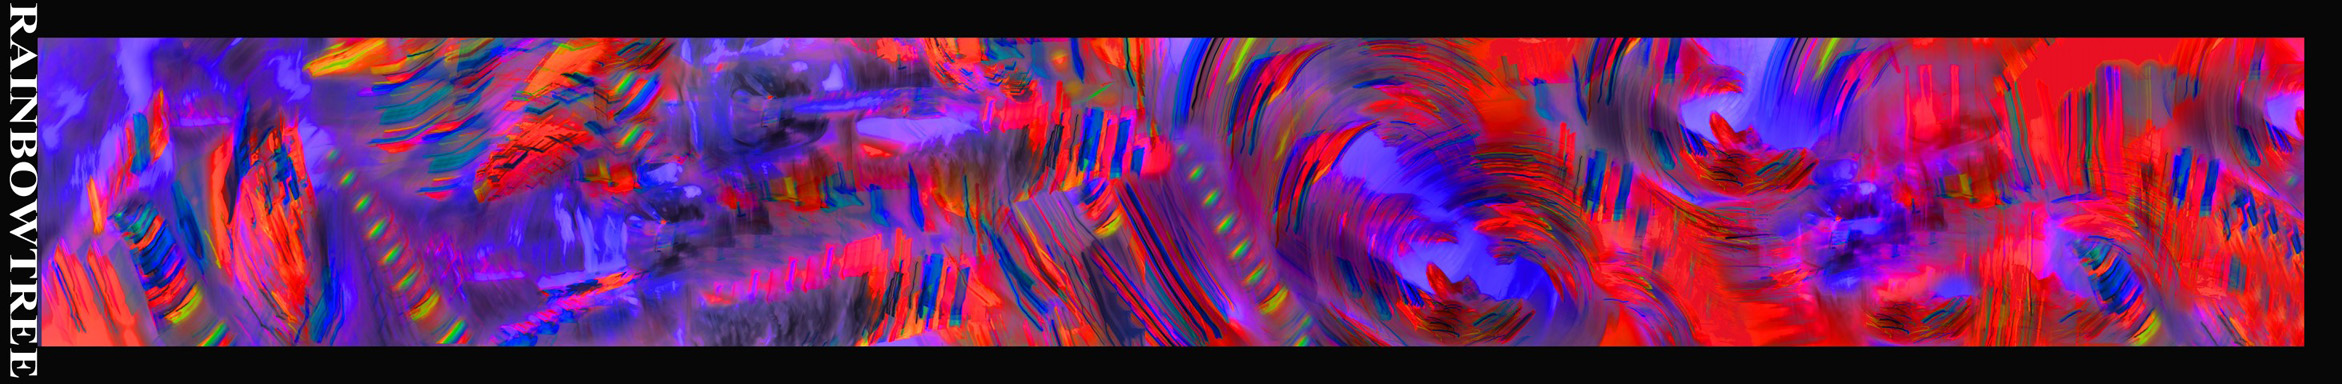 RainbowTree IEU 8 x 60